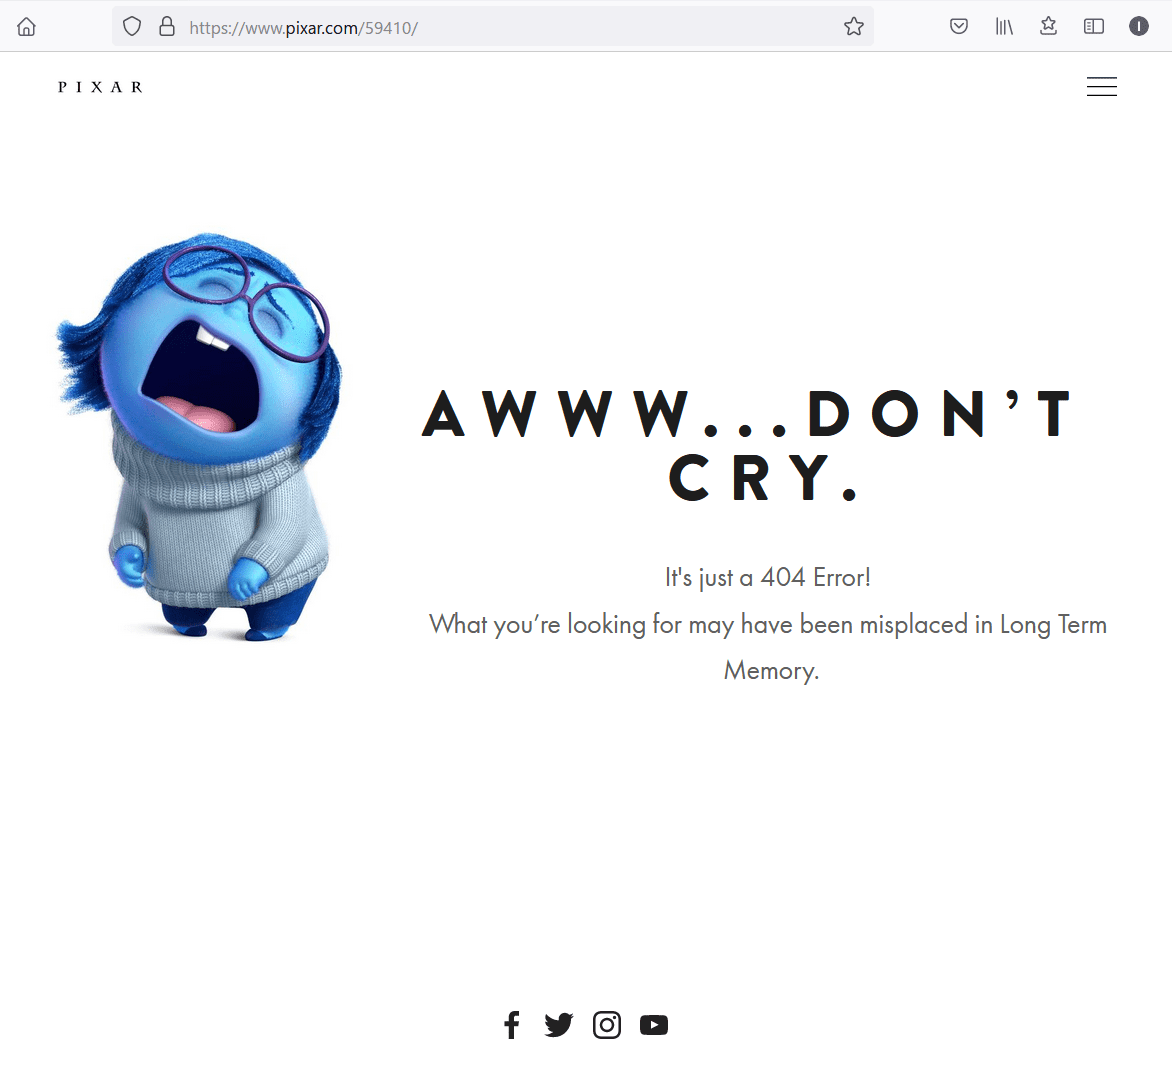 Pixar Animation Studios 404